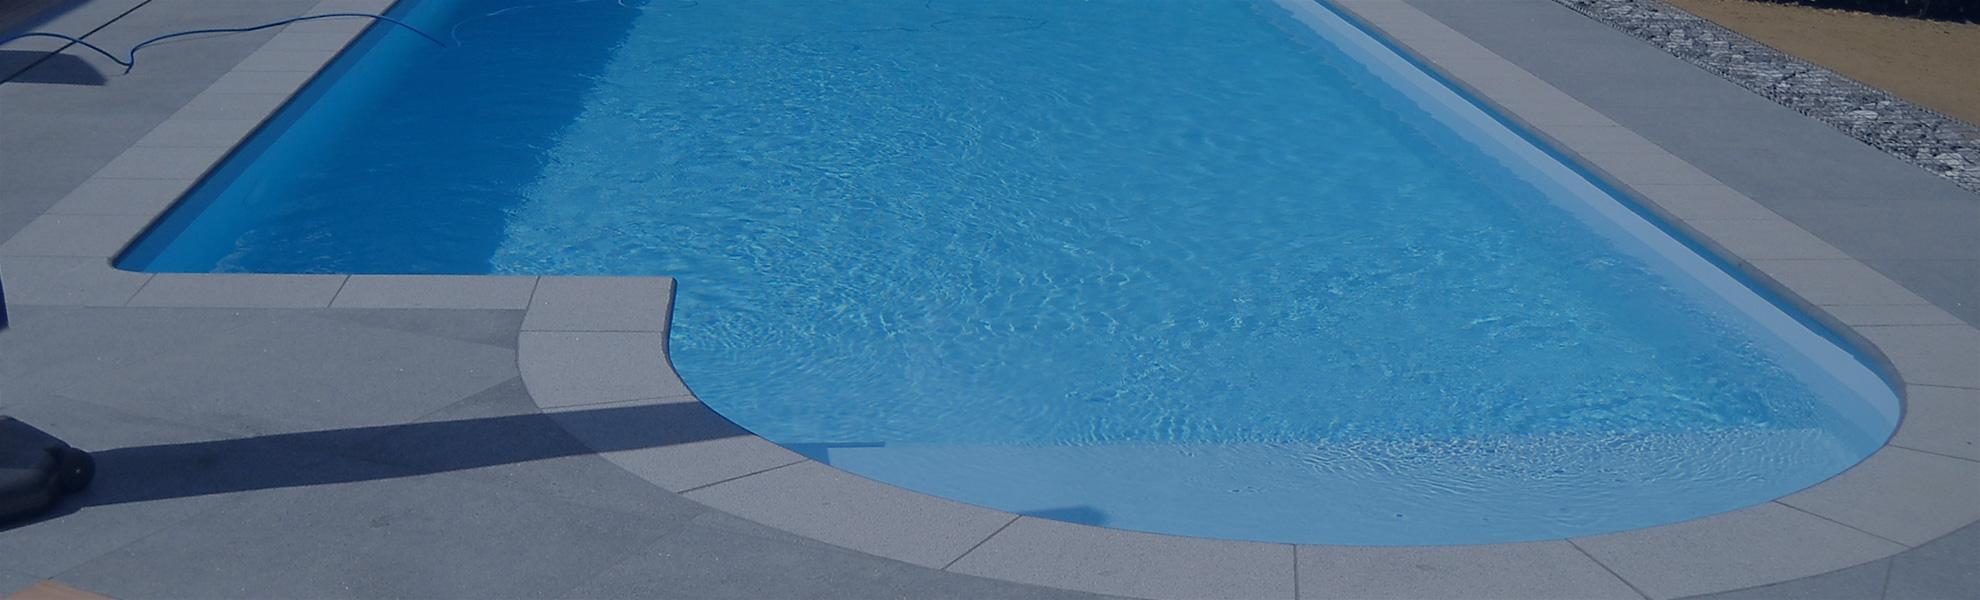 Construction et ralisation de piscine spa sauna hammam